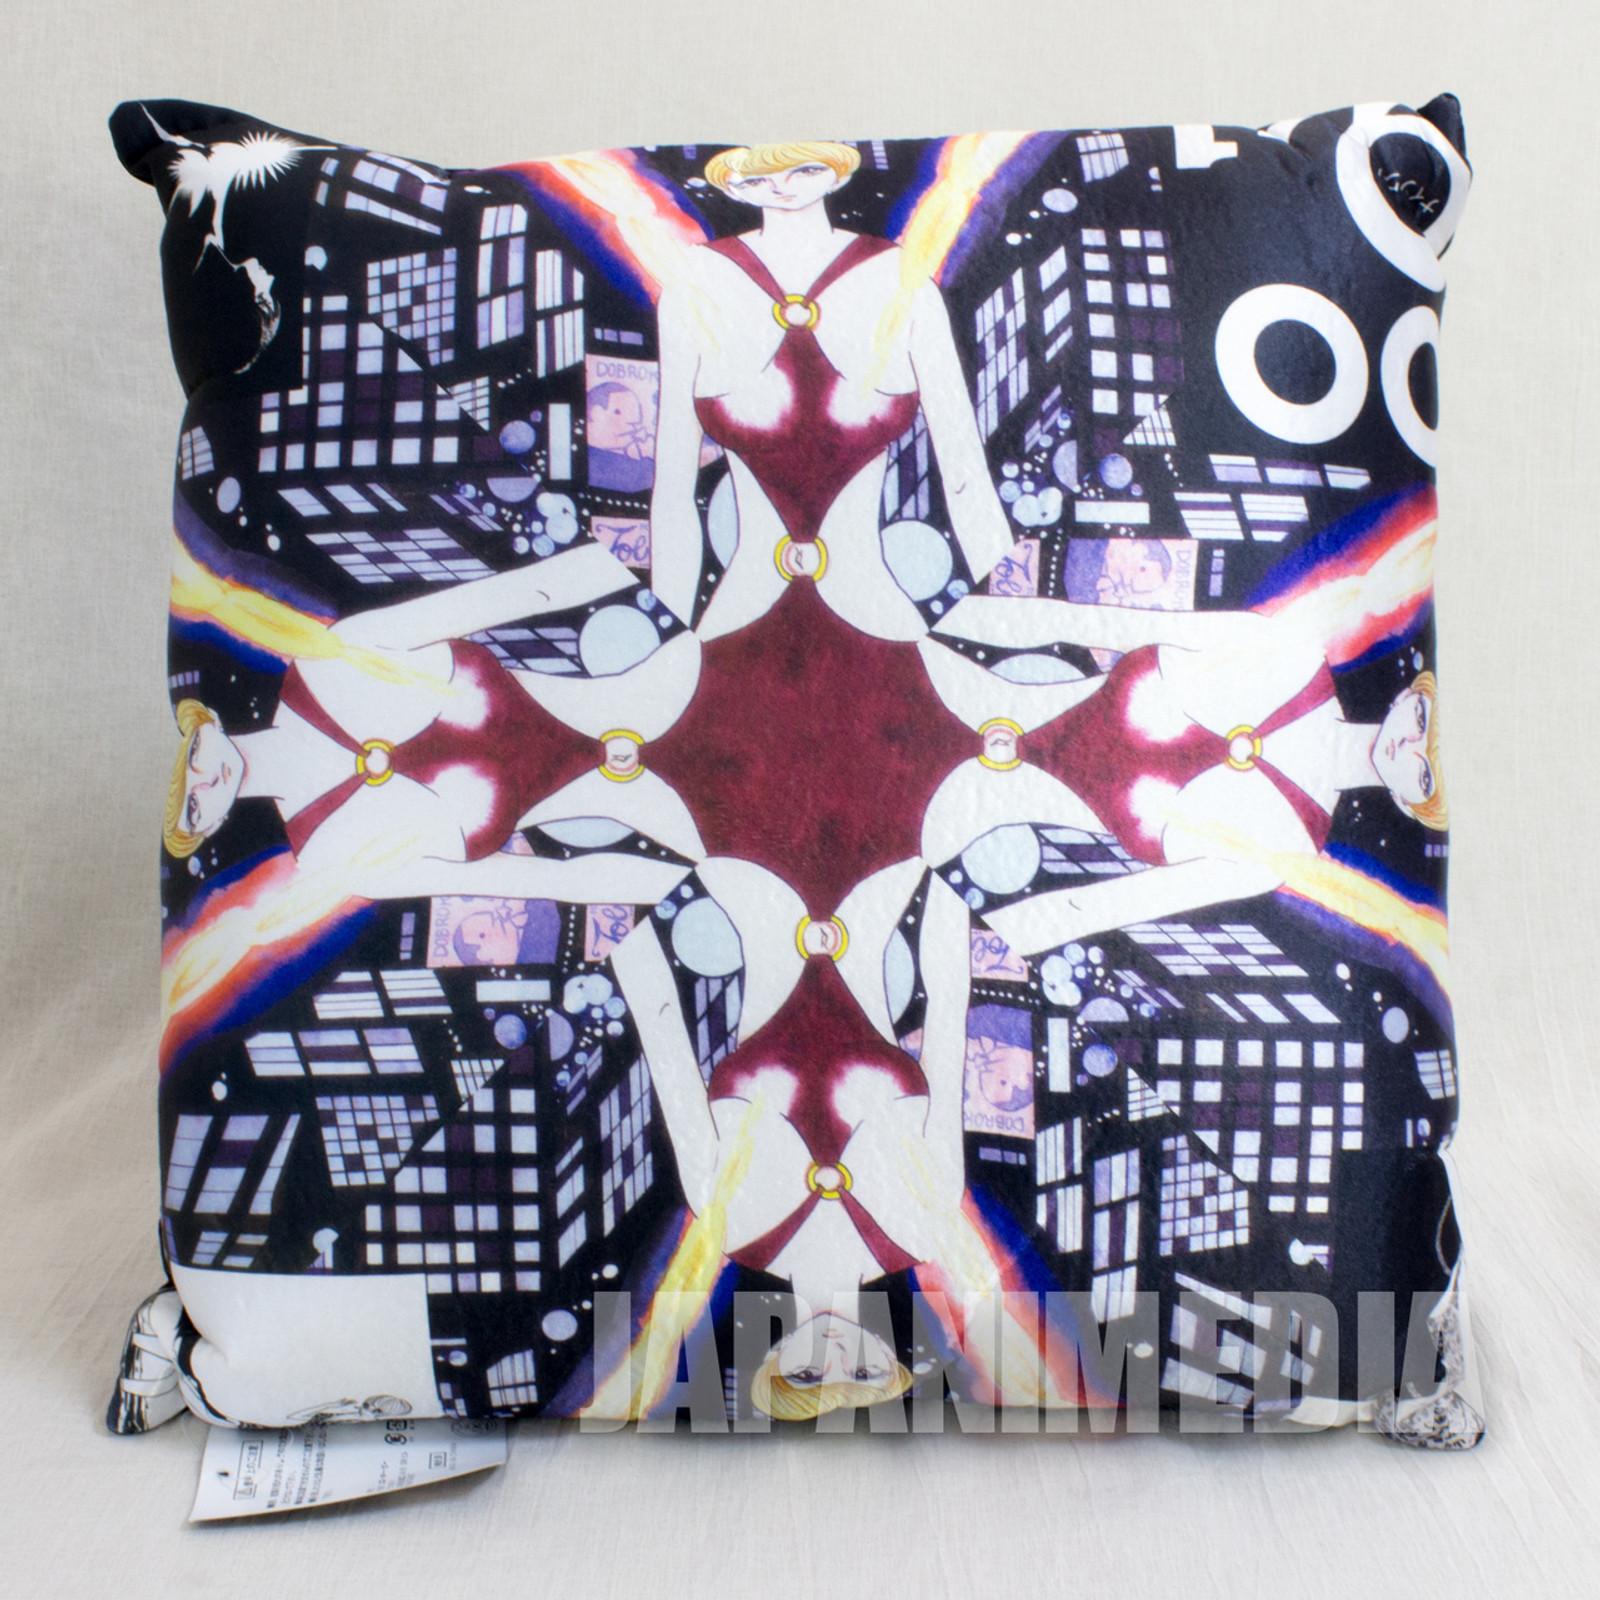 009-1 Mylene Hoffman Satin Cushion 45x45cm #2 JAPAN ANIME CYBORG ISHINOMORI